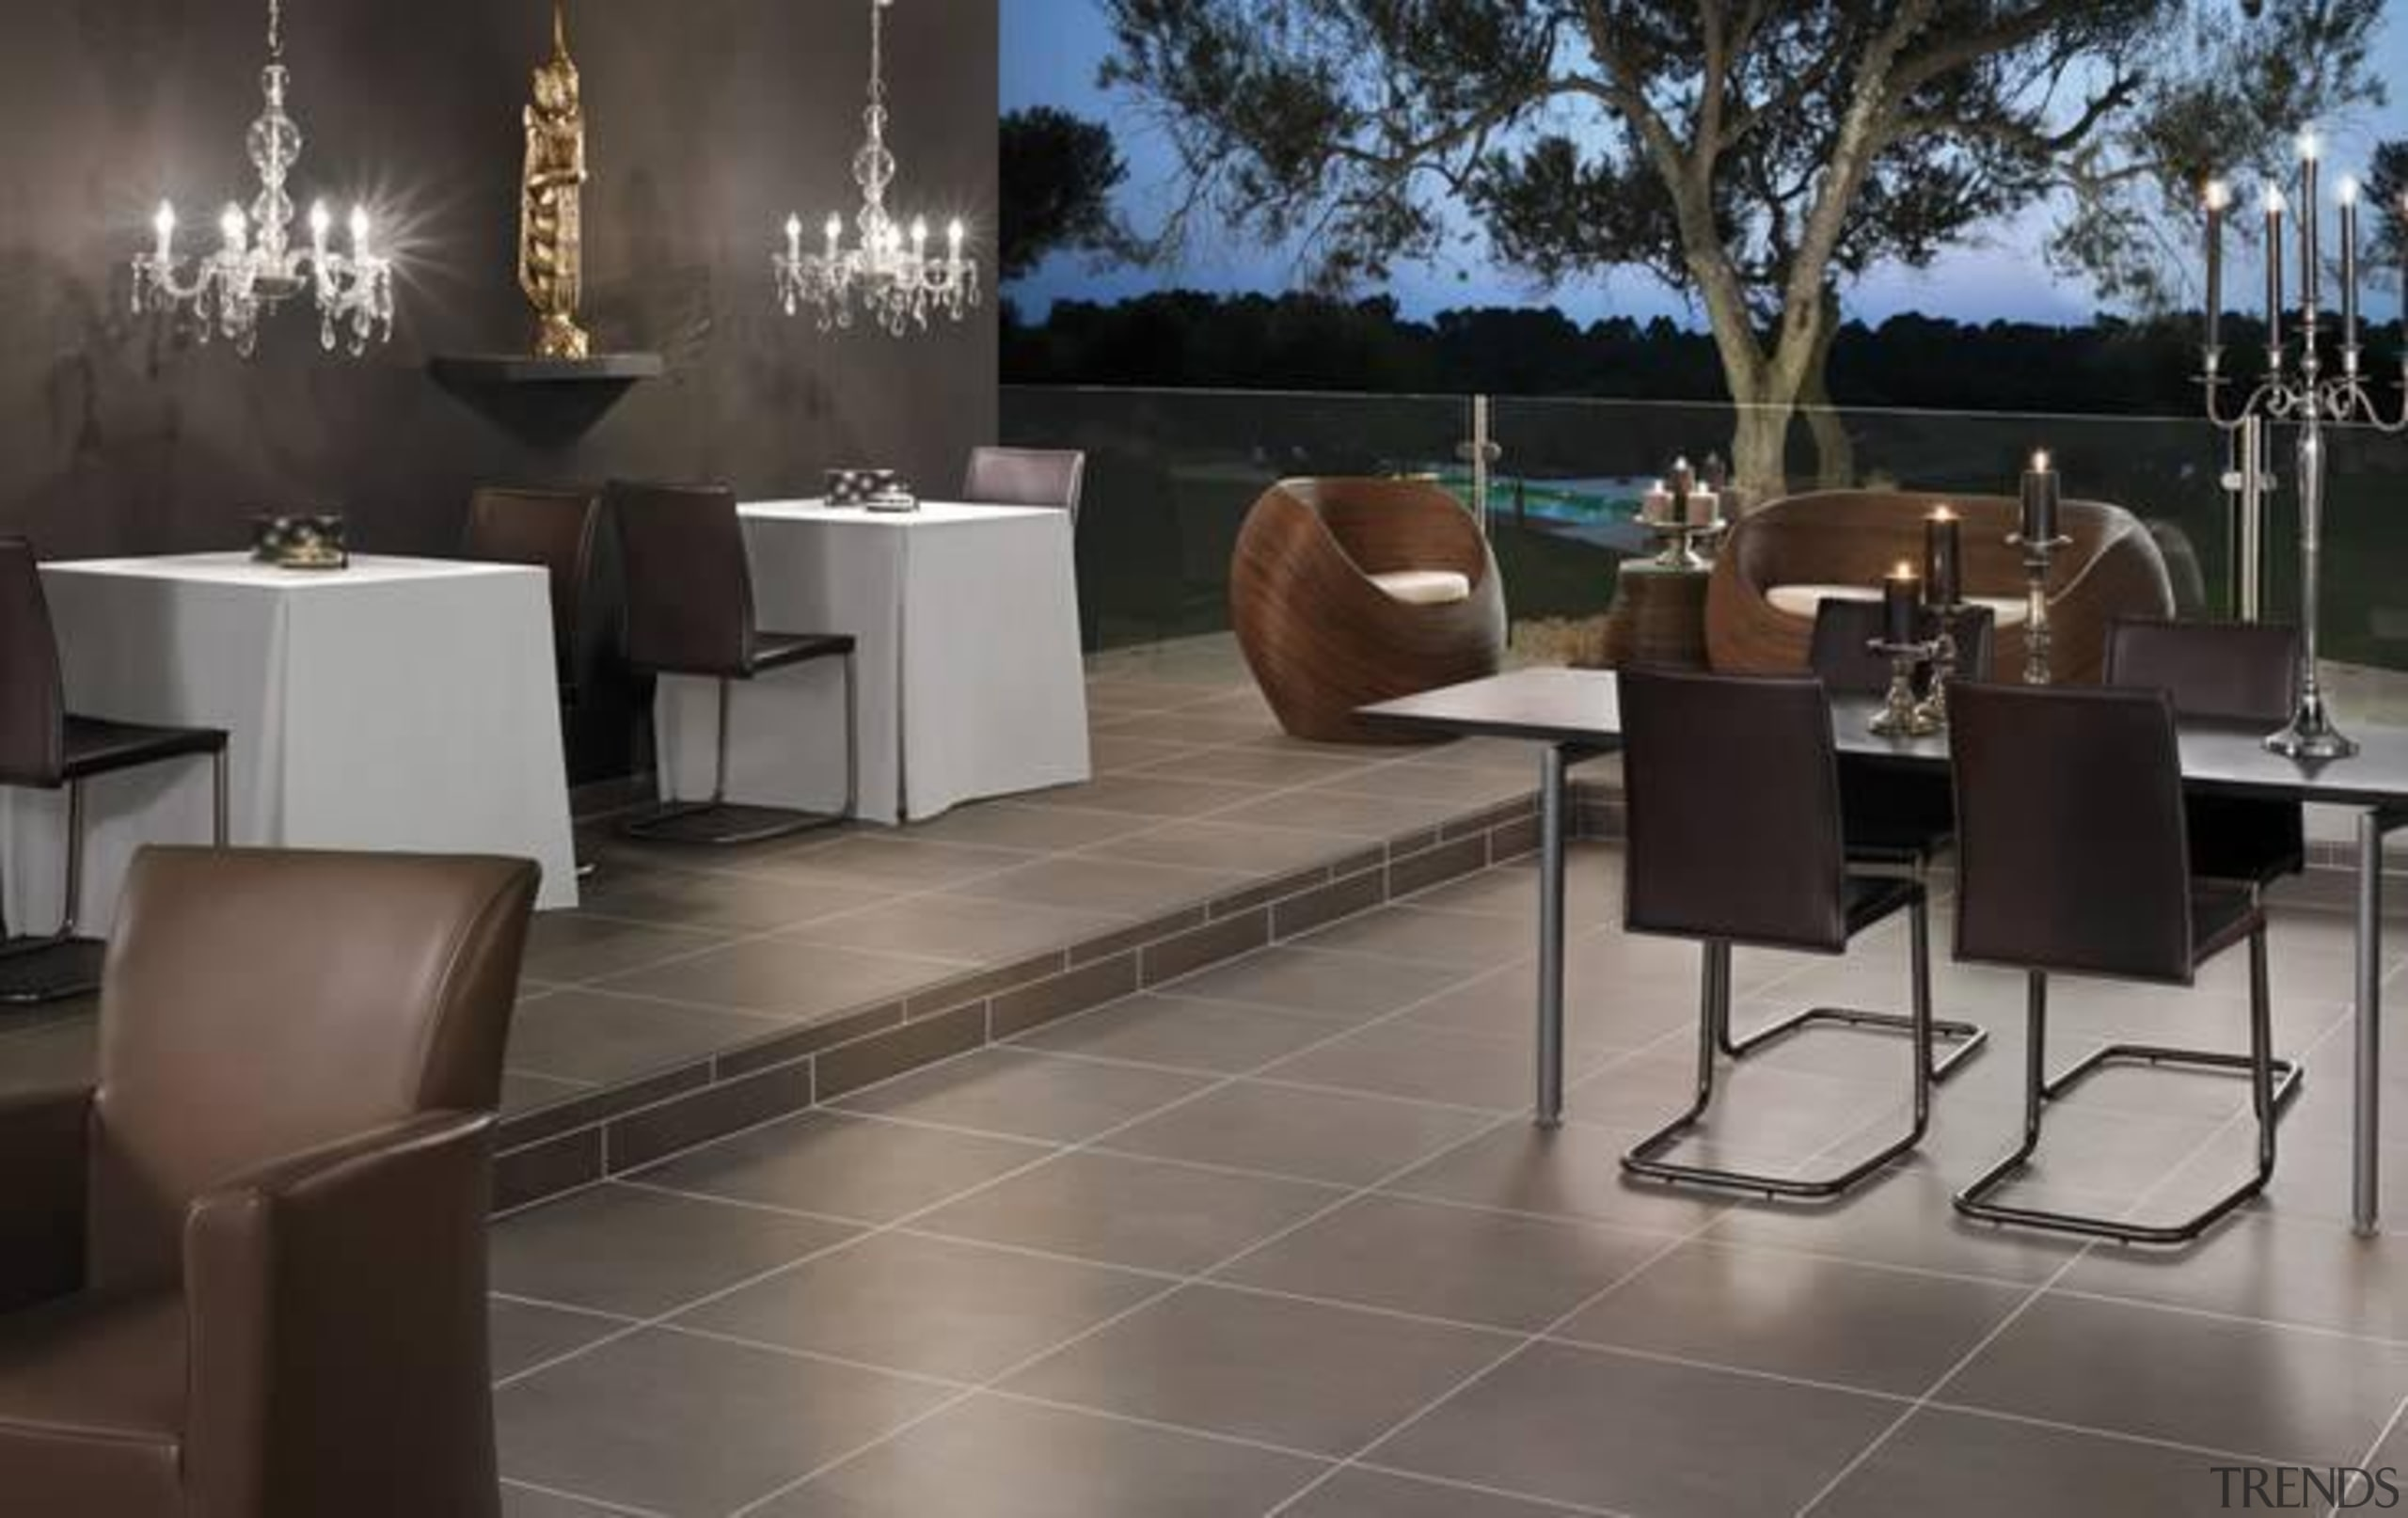 Earthstone clay grey dining floor tiles - Earthstone chair, floor, flooring, furniture, interior design, restaurant, table, tile, gray, black